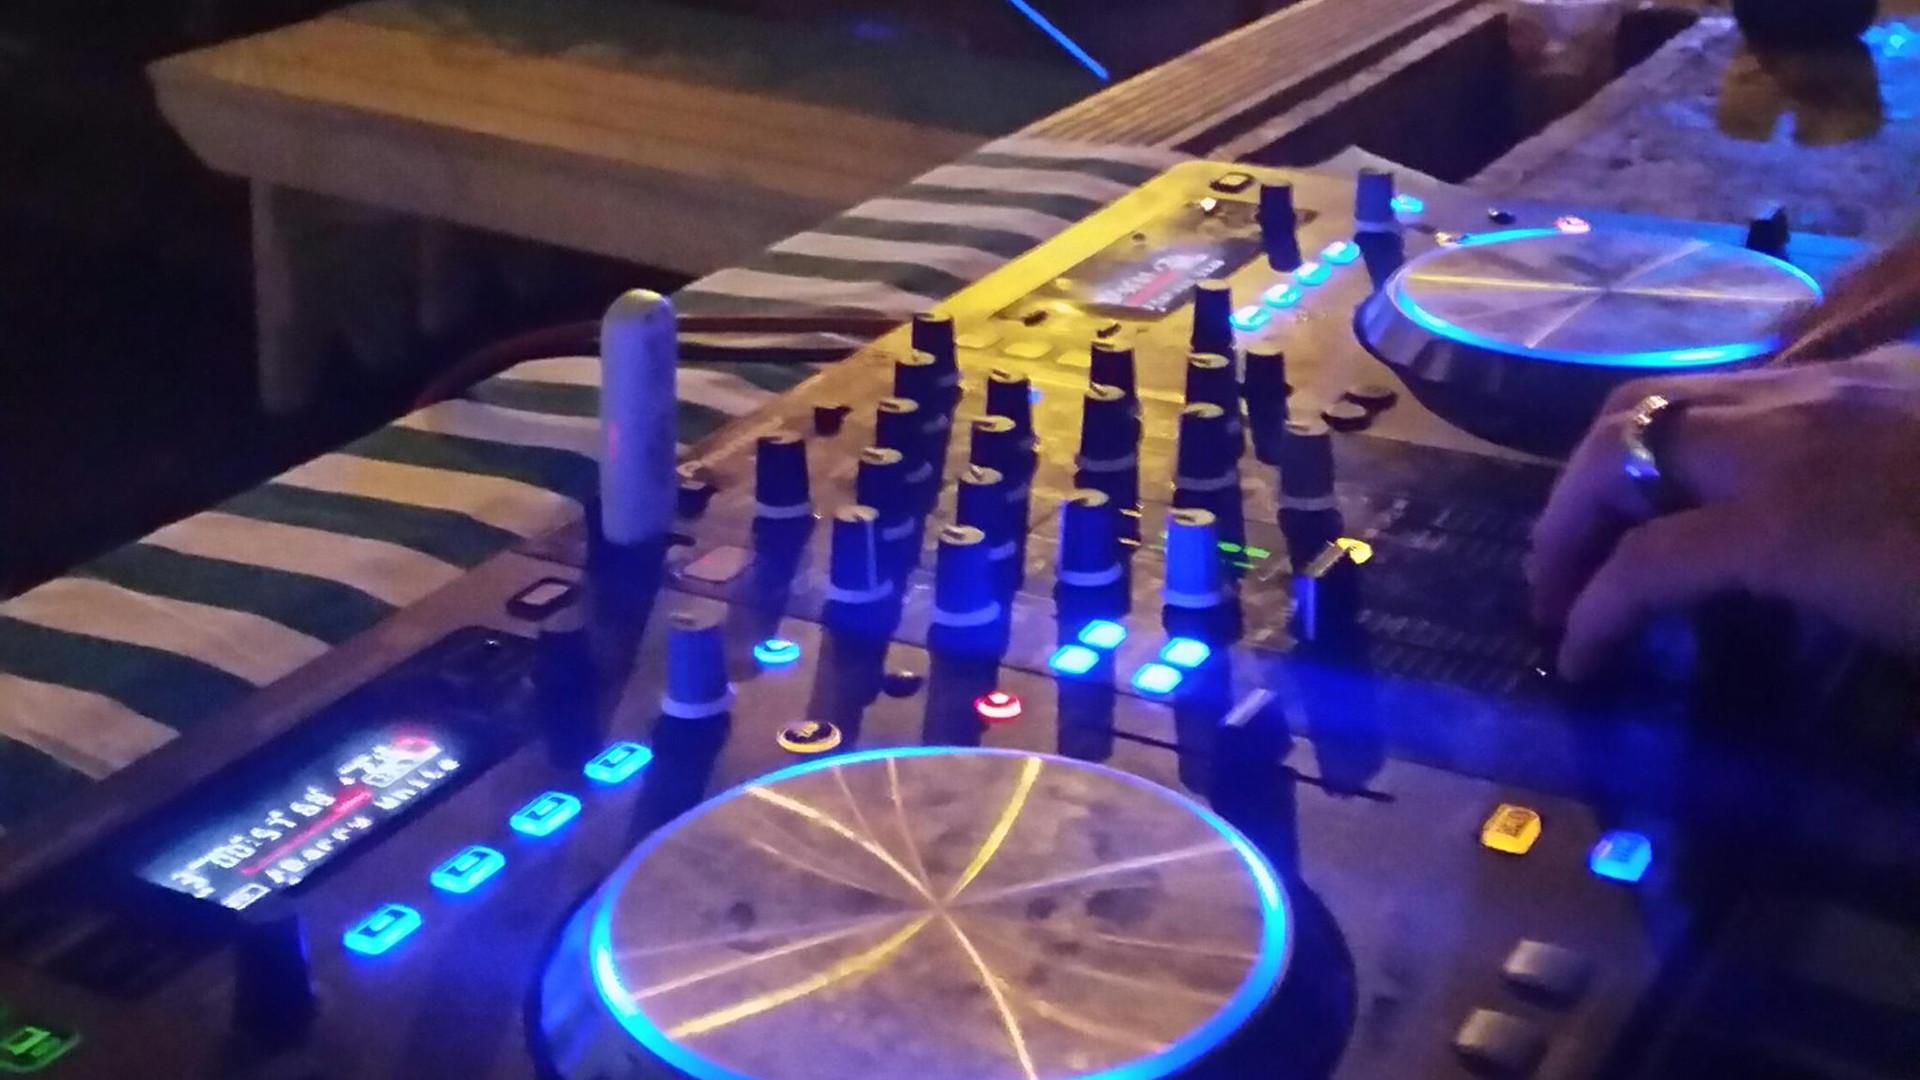 DJ mixtable during wedding party